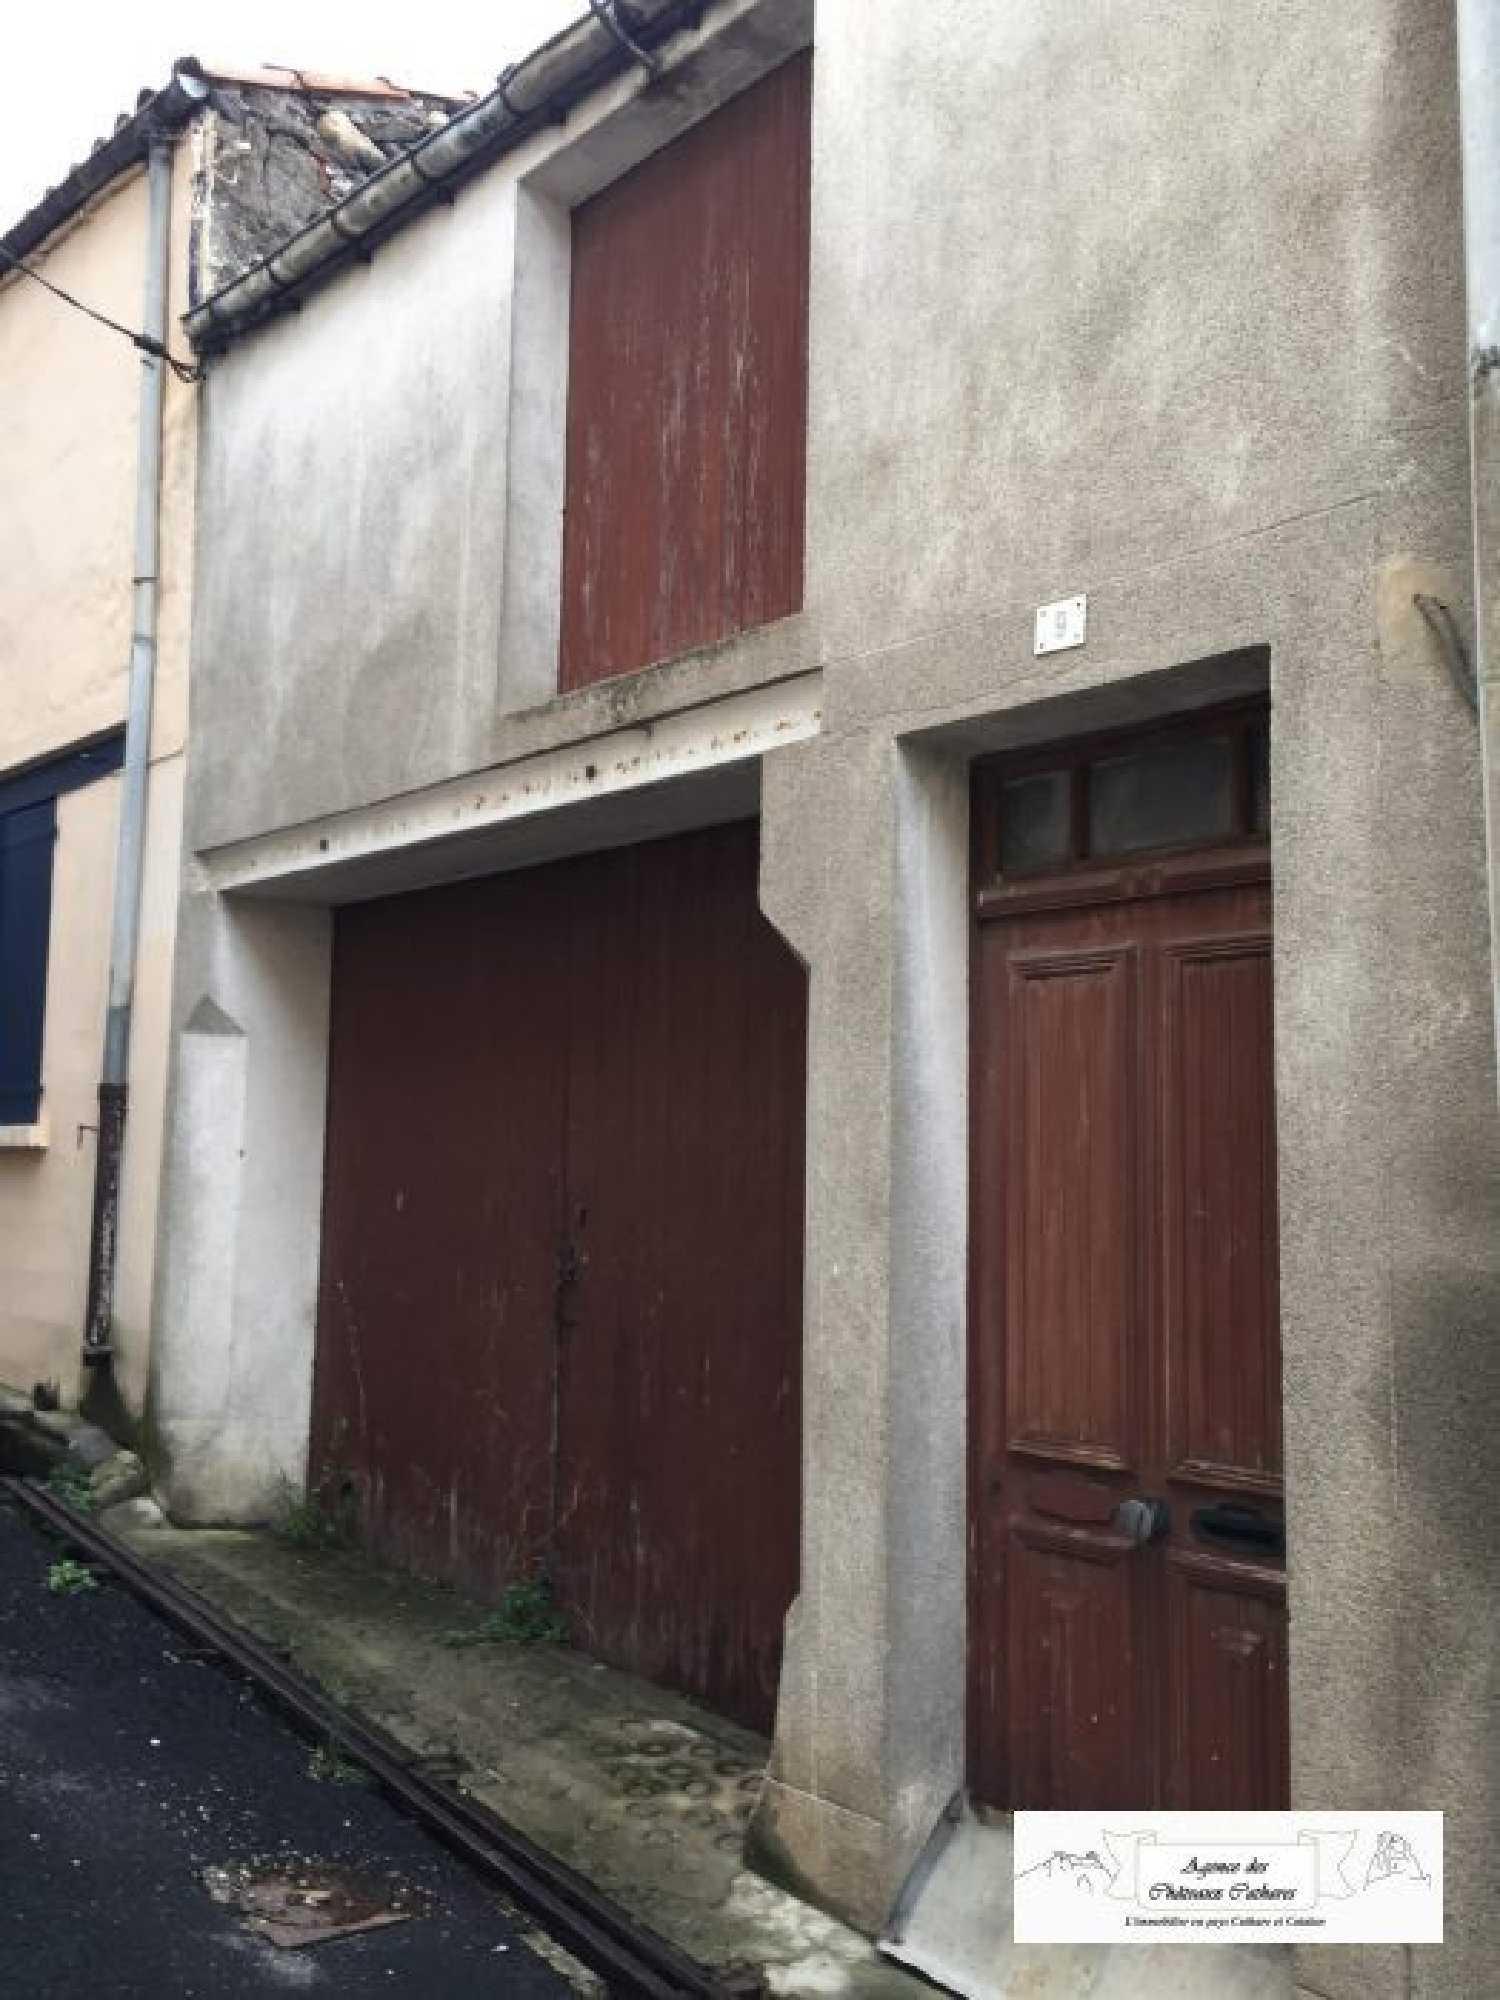 Caudiès-de-Fenouillèdes Pyrénées-Orientales Haus Bild 4202156